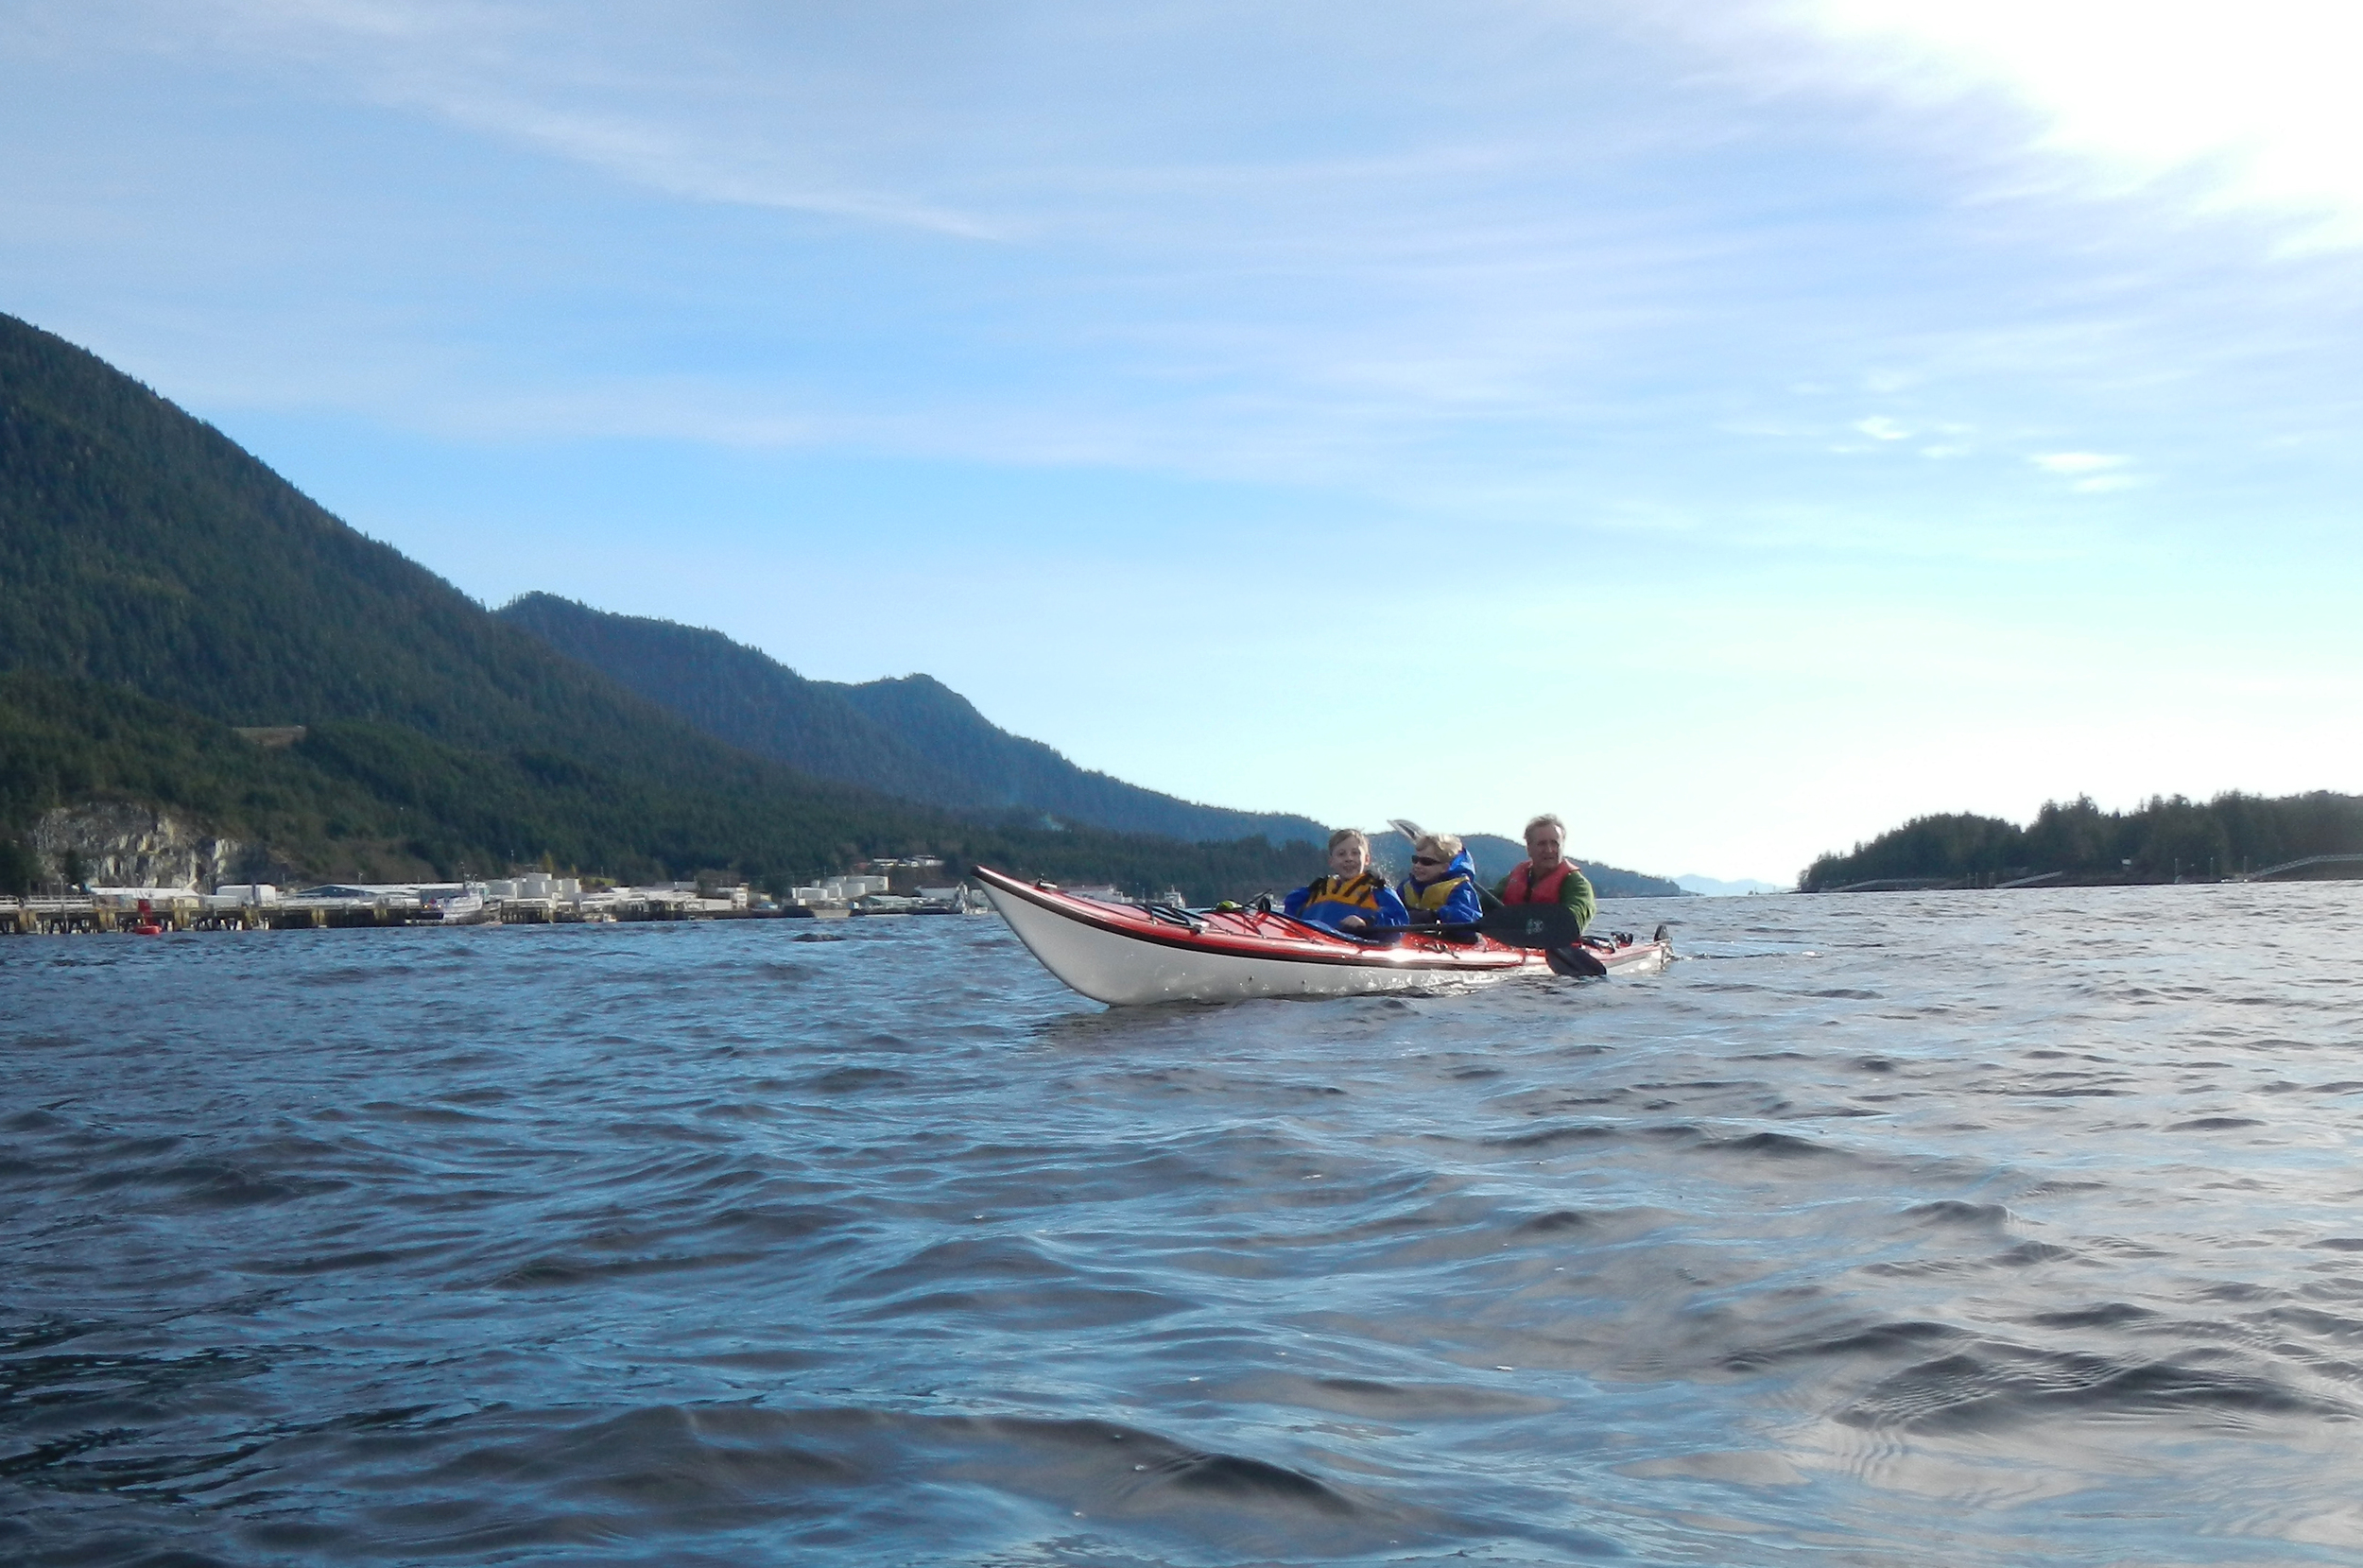 Family paddling in our Seaward Passat G3.